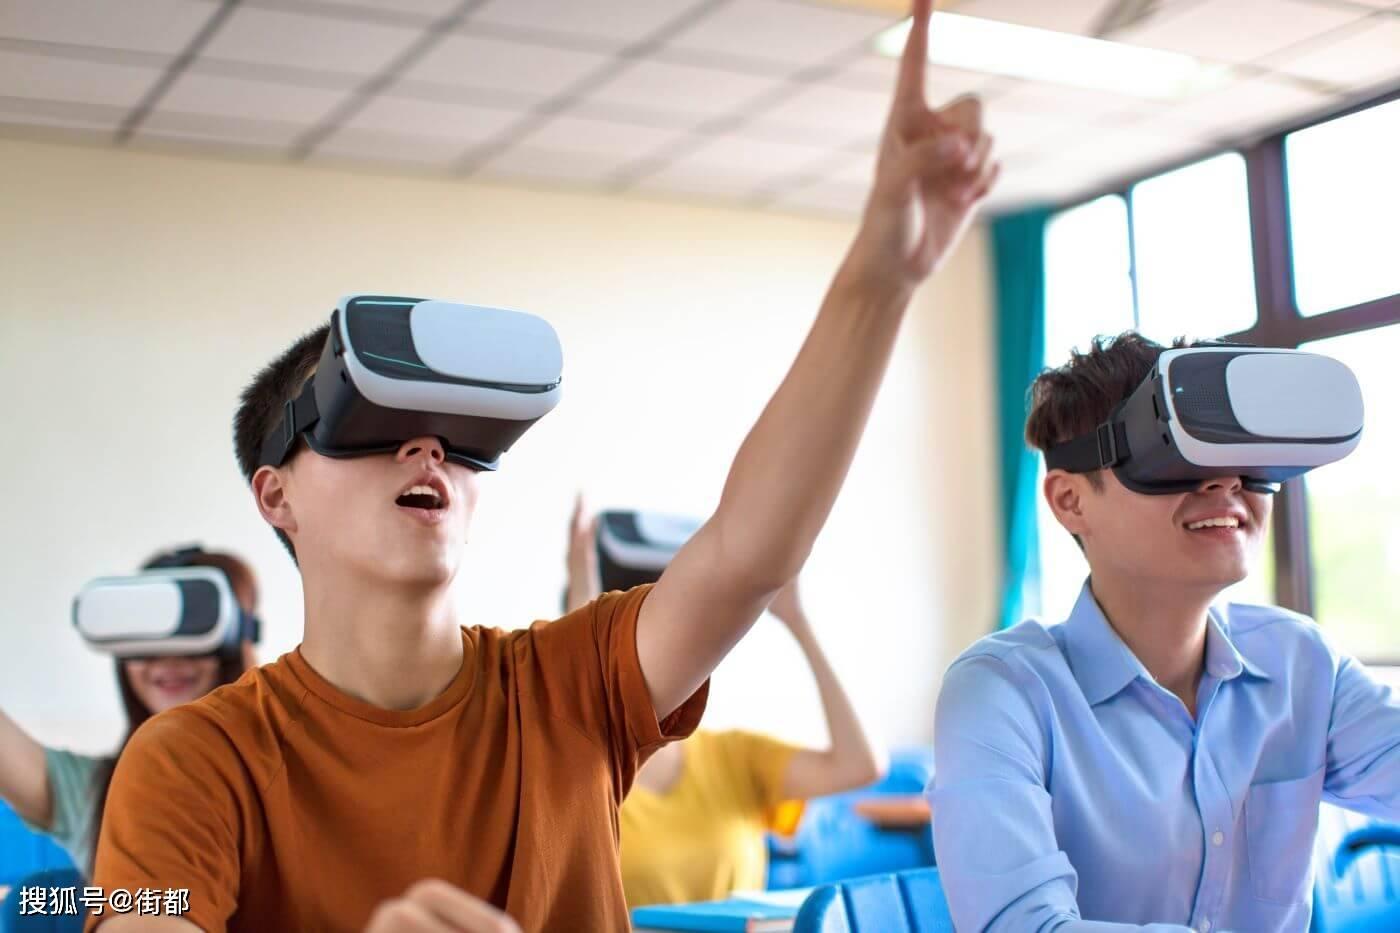 VR正在为运发动、教练和观众带来革命性